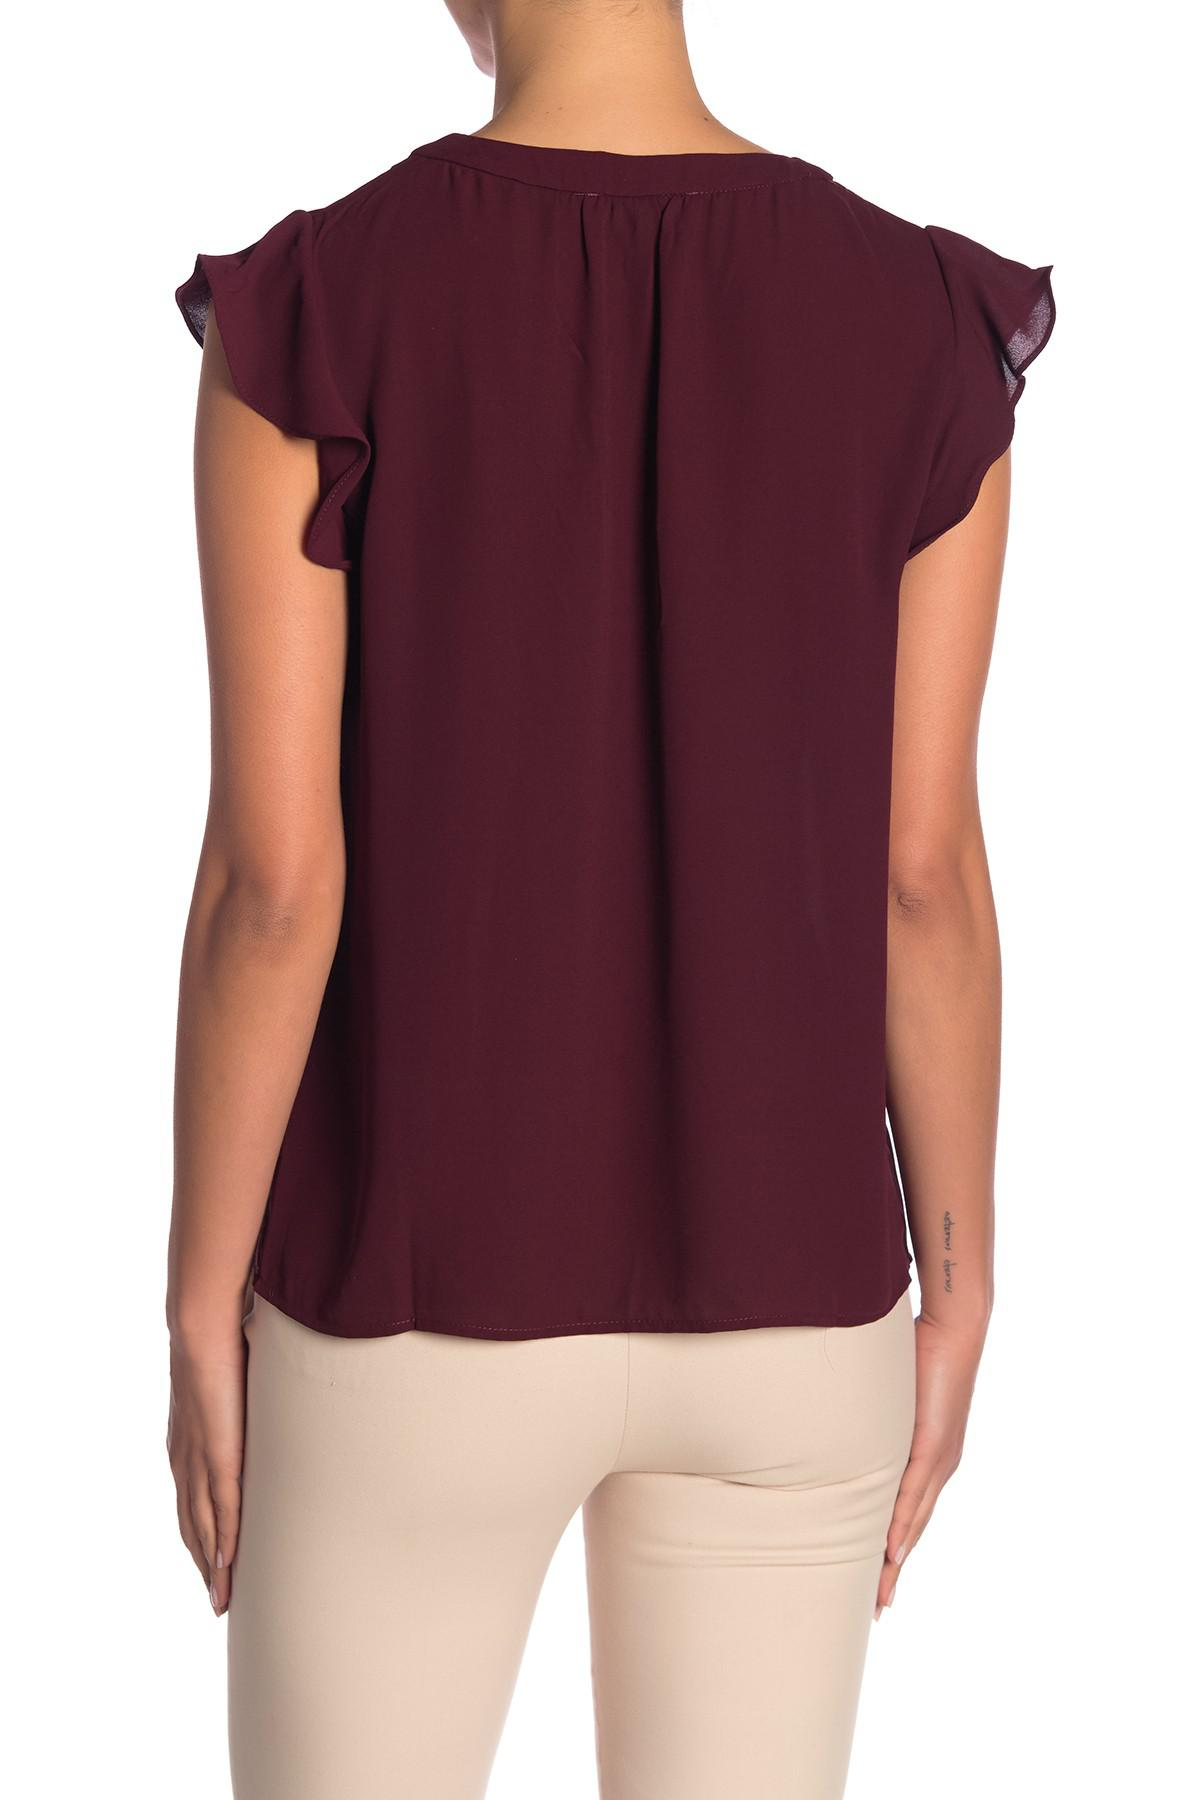 ff8986b9b11940 Philosophy Apparel - Purple Solid Ruffle Sleeve Blouse - Lyst. View  fullscreen